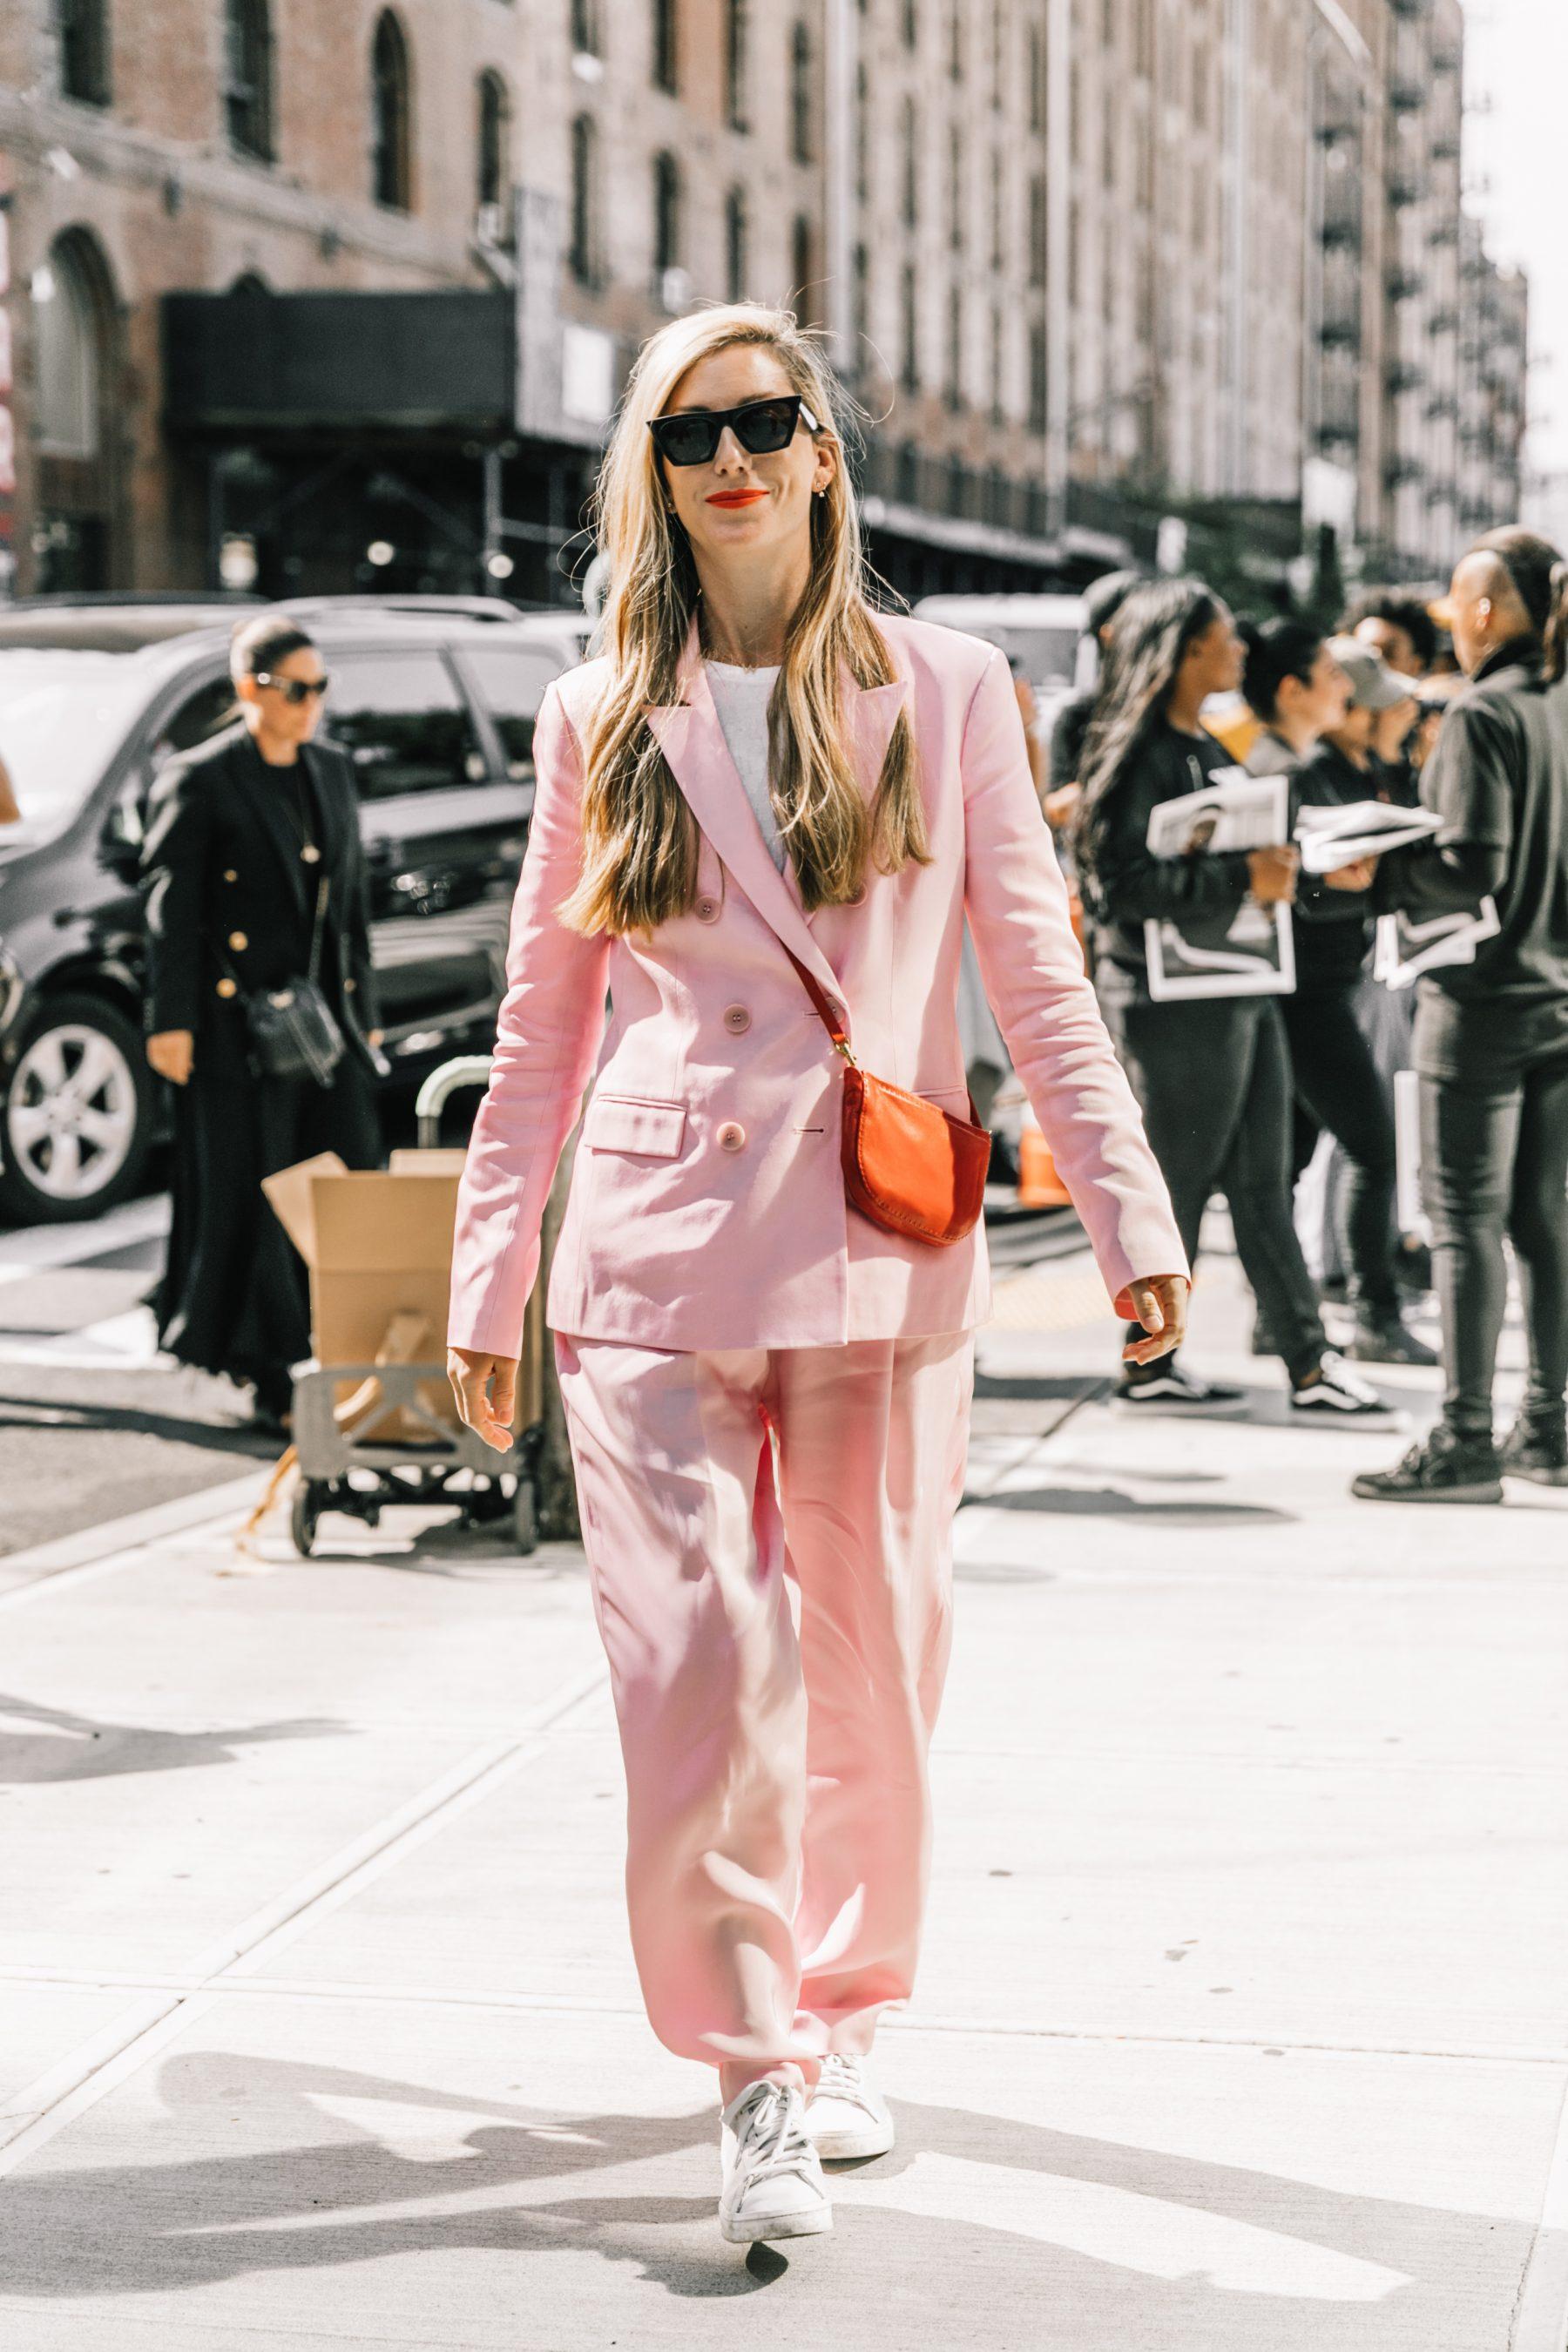 Street Style Fashion Layered Style: NYFW SS18 Street Style IV